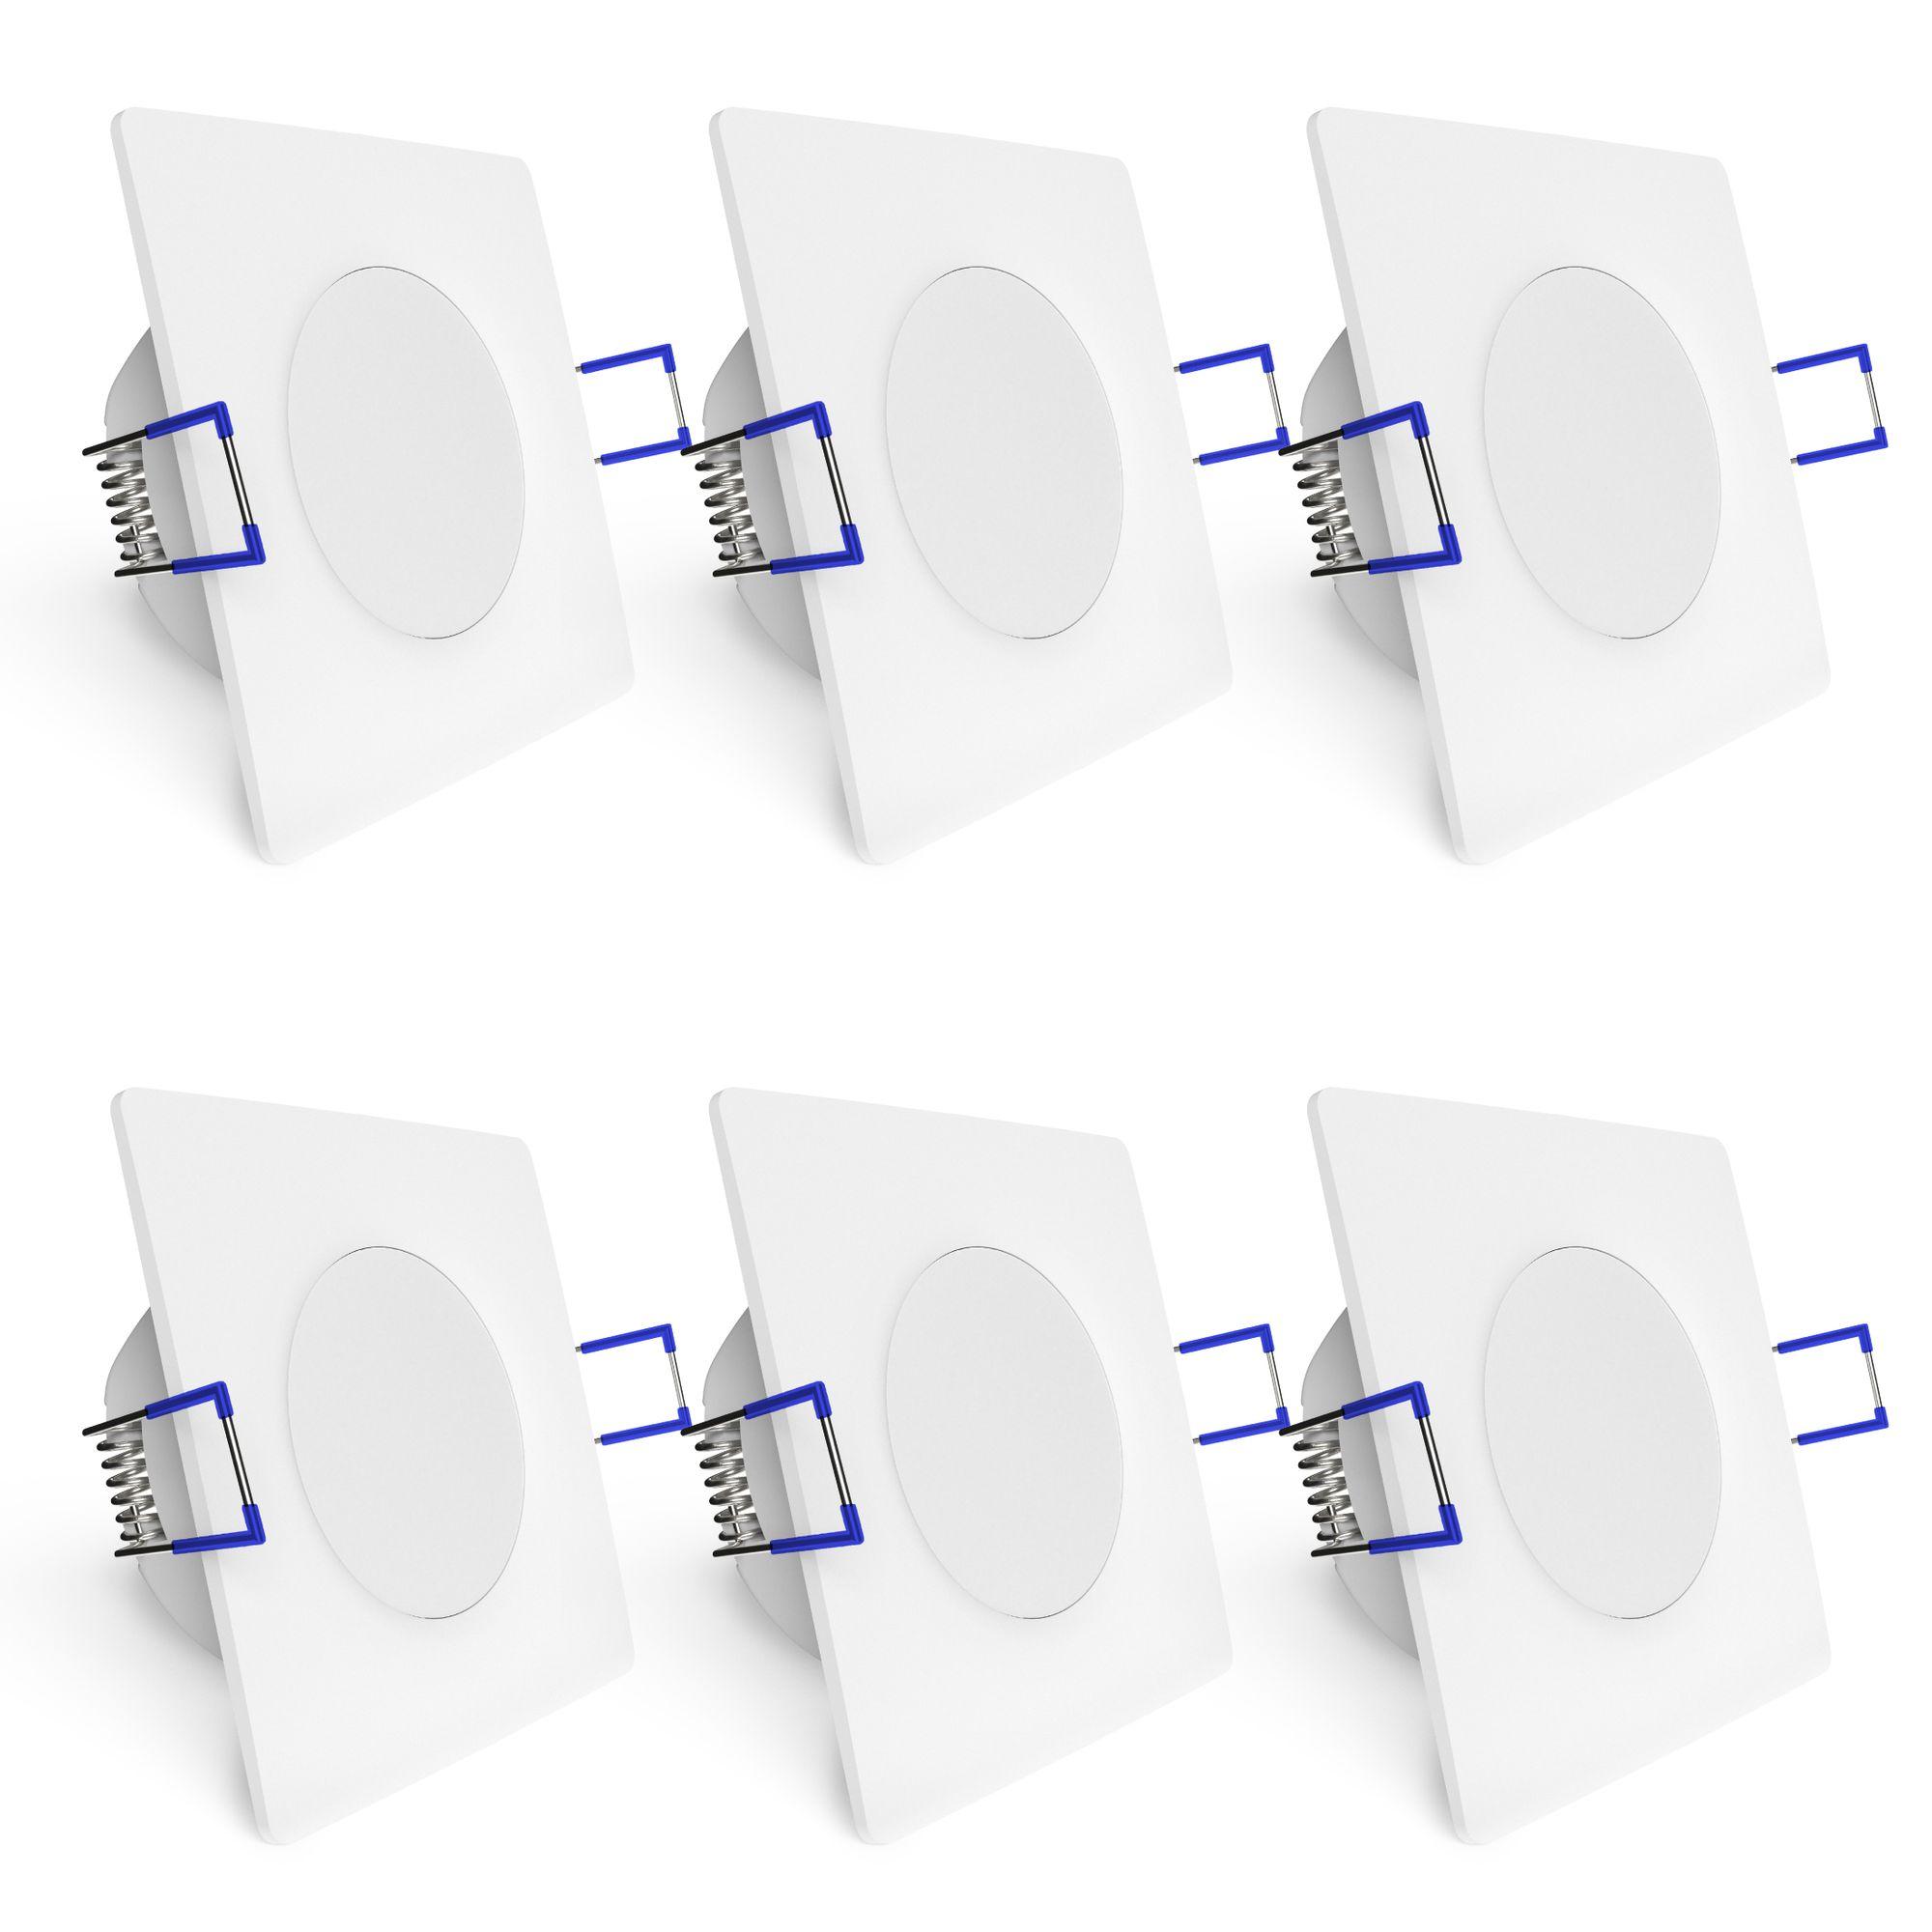 linovum ETAWA LED Einbaustrahler IP44 extra flach 35mm mit 5W LED warmwei/ß 230V Einbauspot Bad au/ßen wei/ß rund 230V